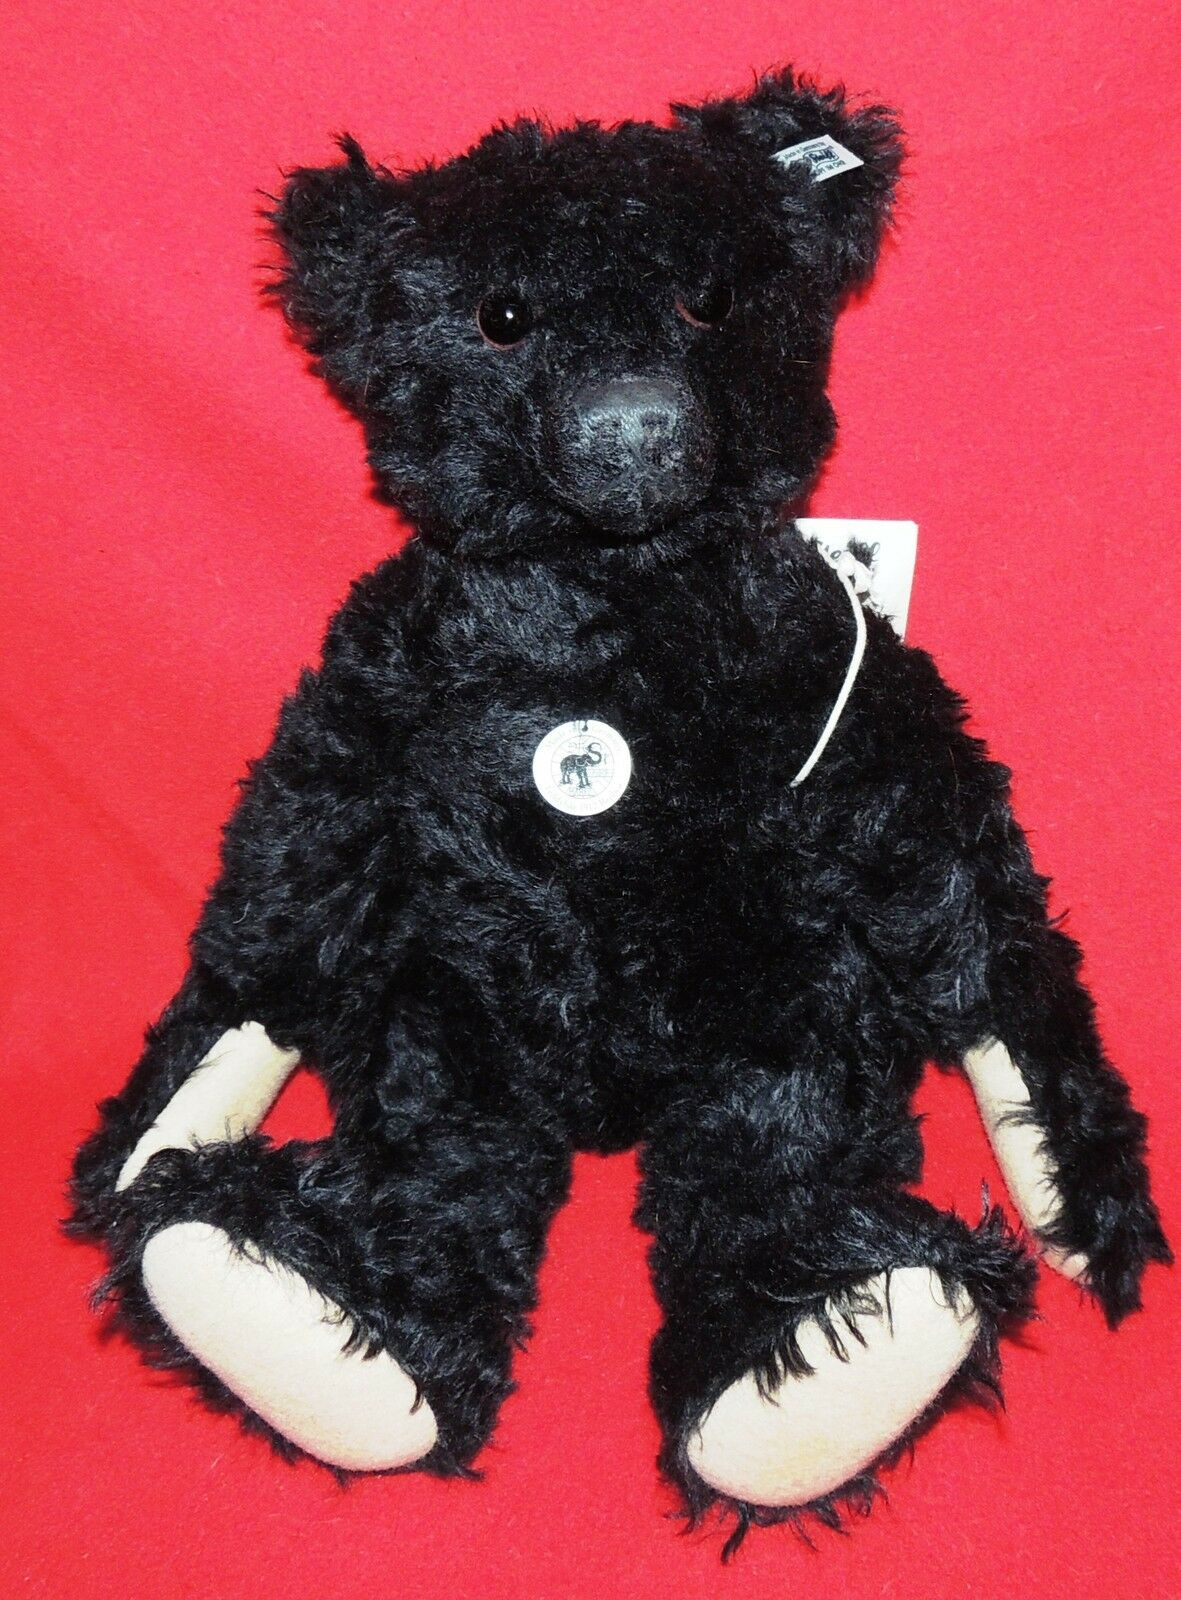 Peluche STEIFF. Teddybär 1912 replica. Grand ours negro 50 cm.   NEUF